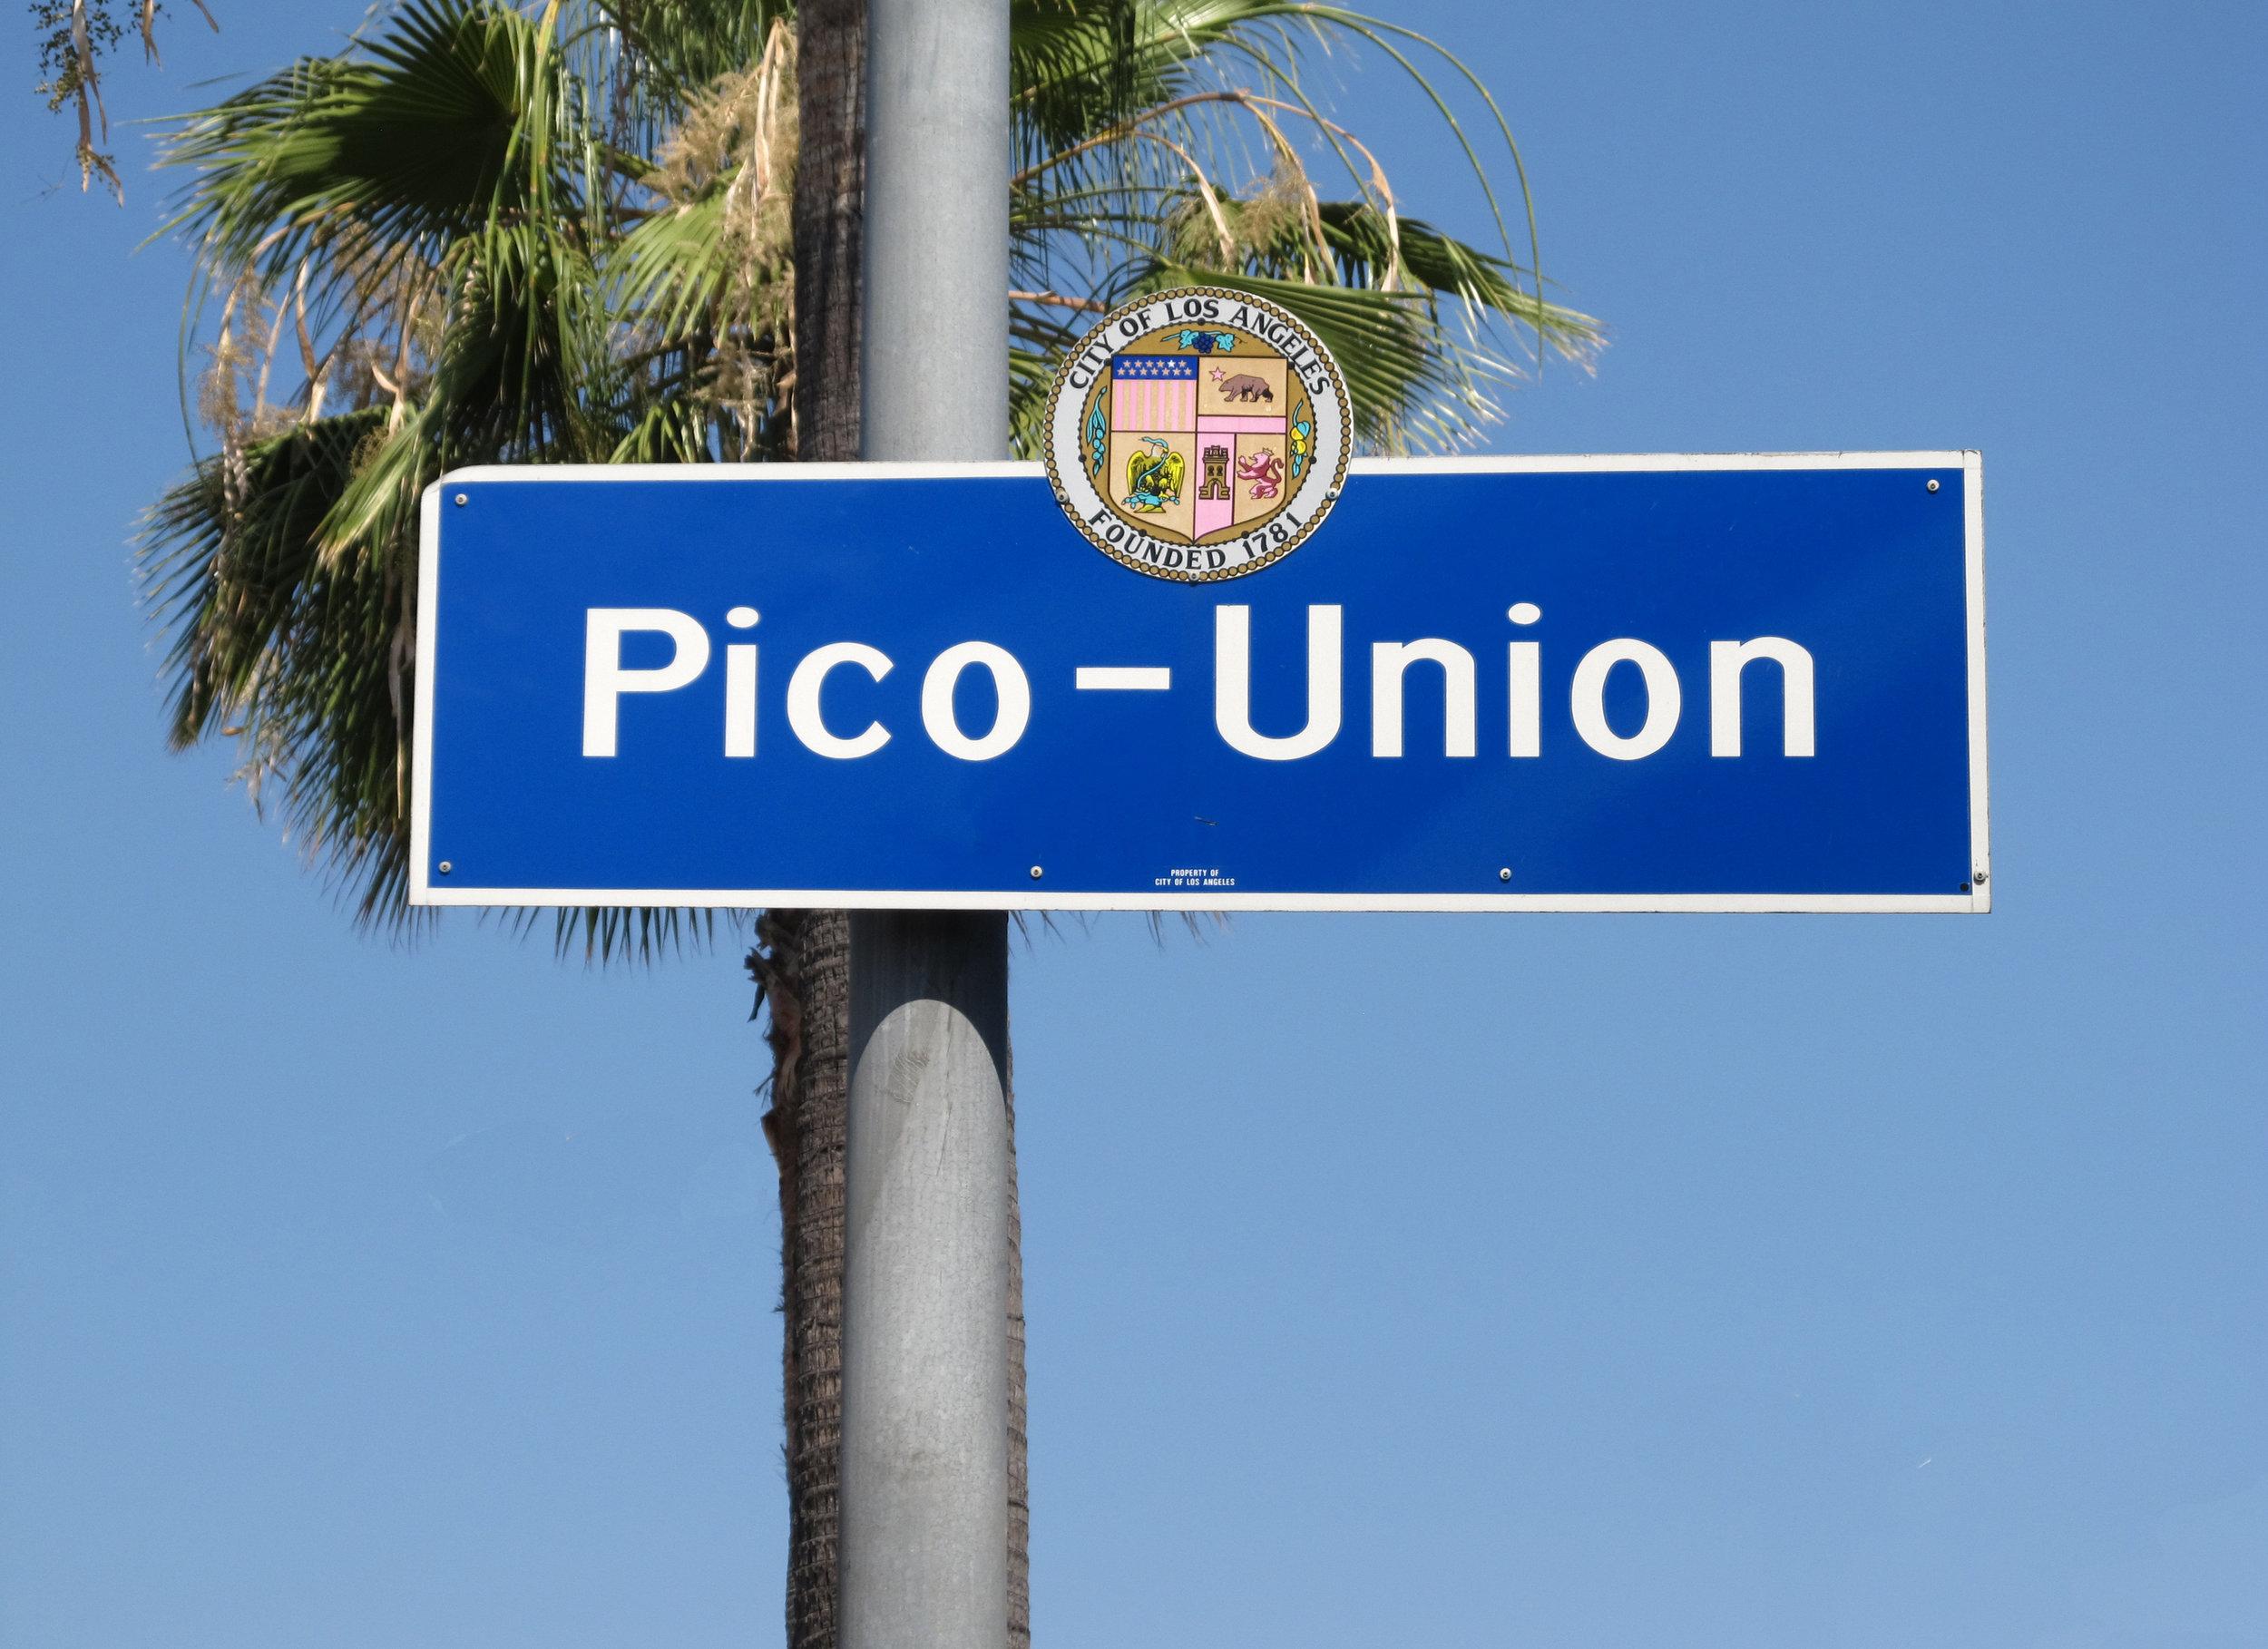 Pico_Union_signage.jpg